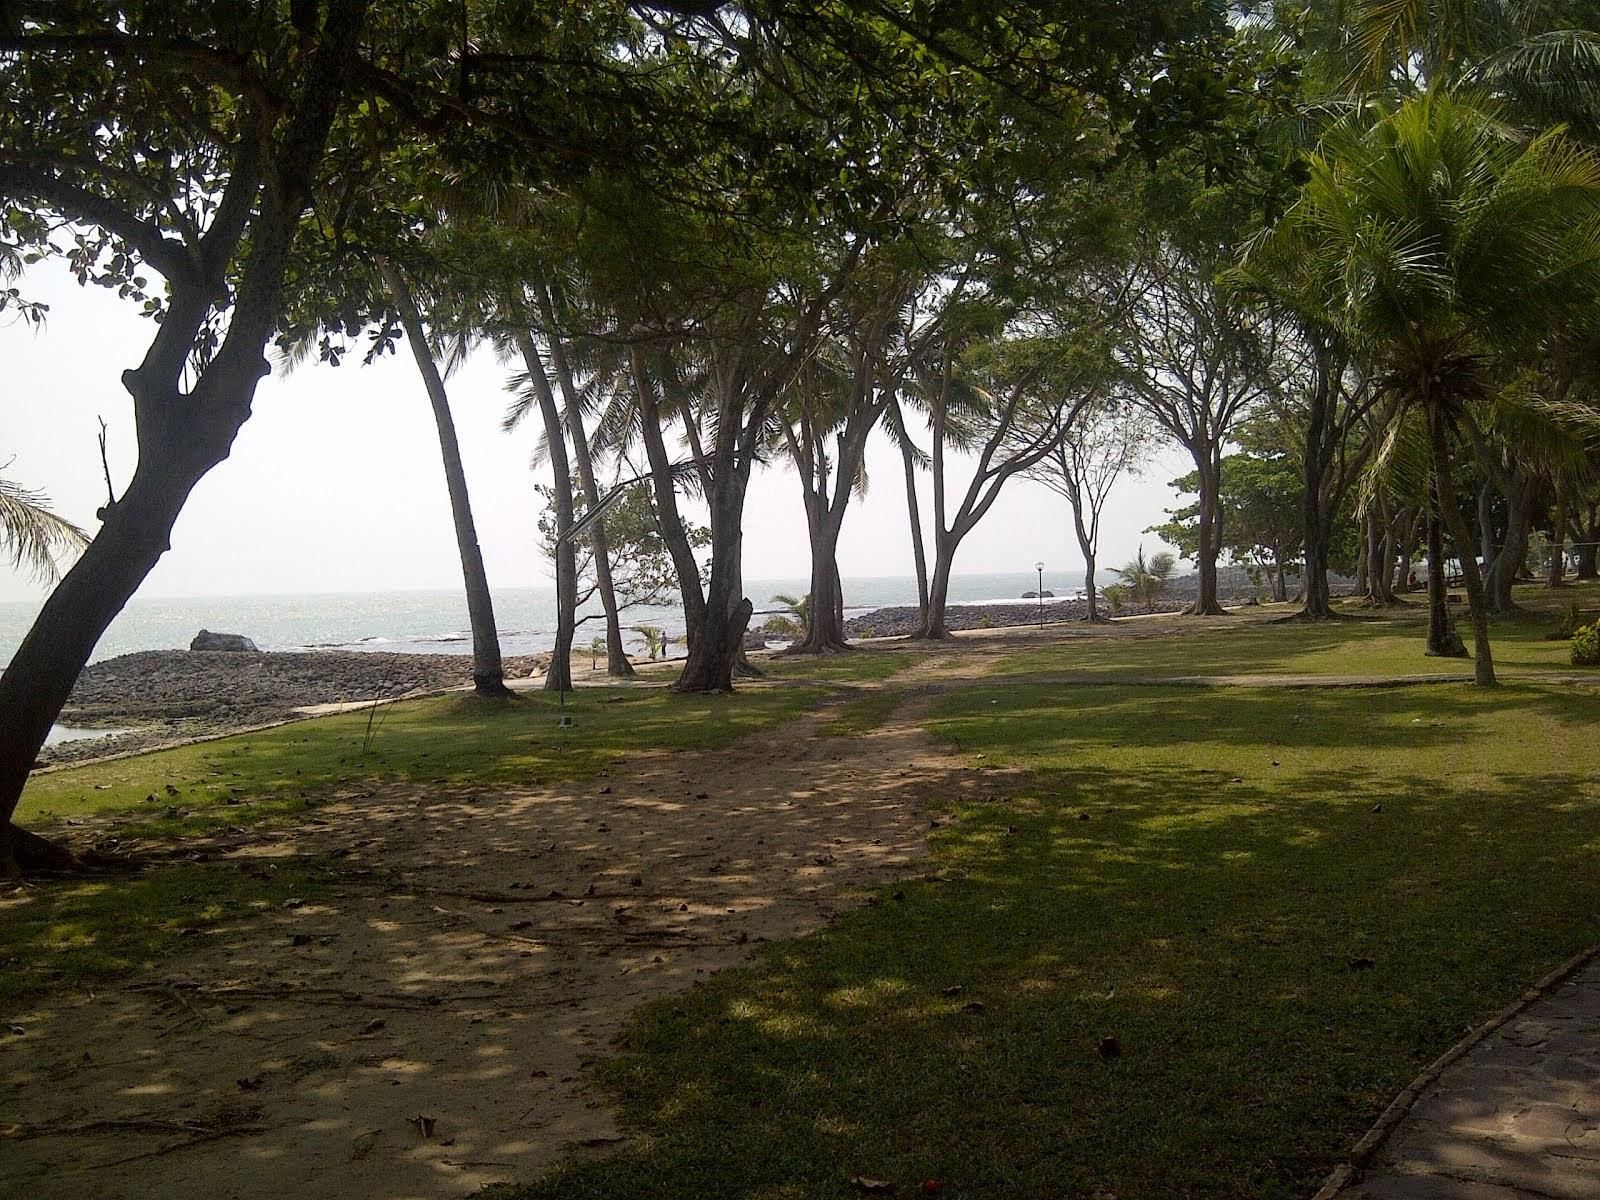 taman samping pantai